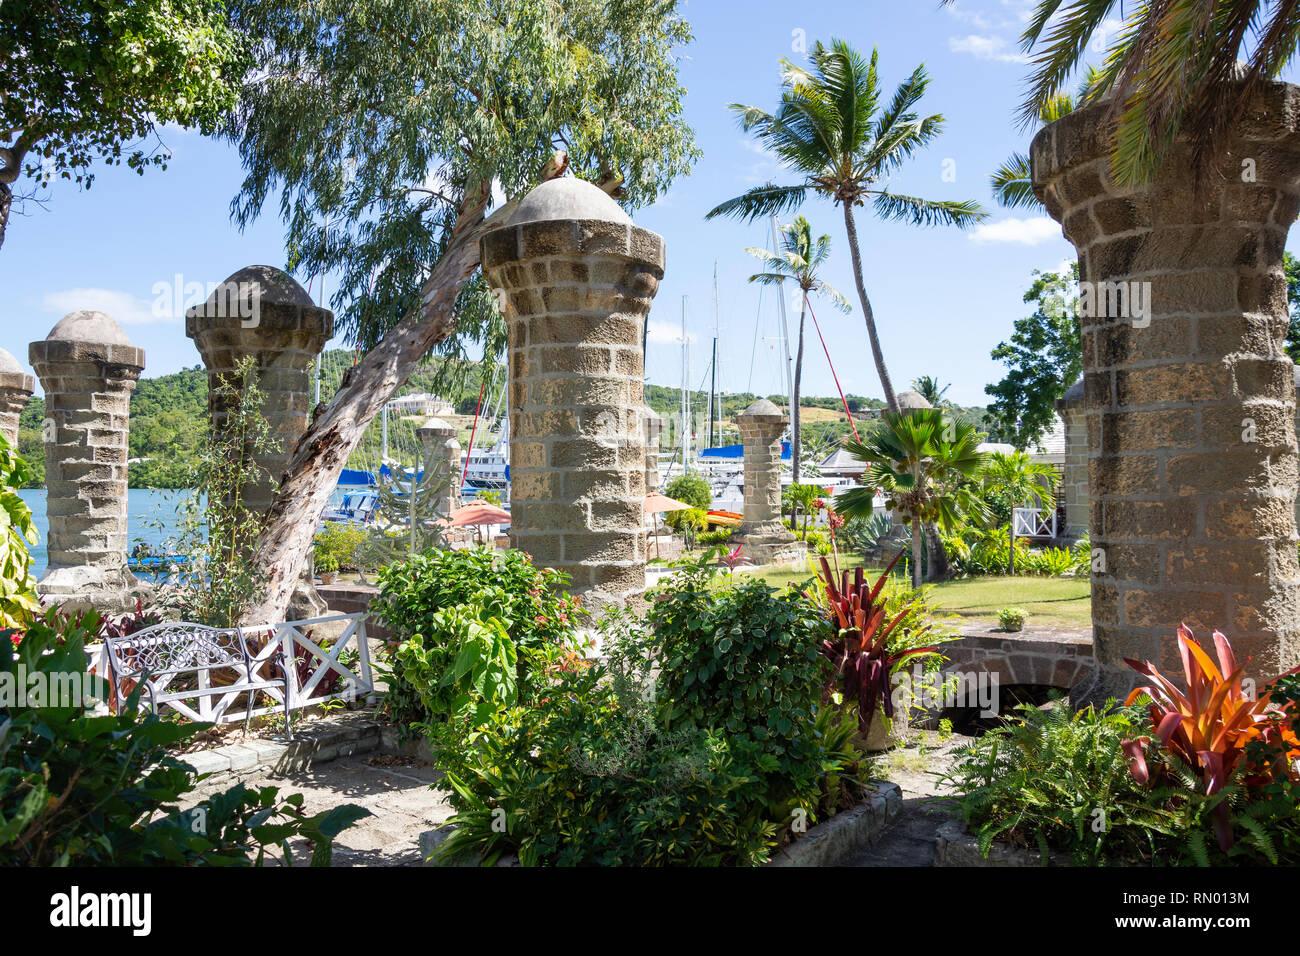 Säulen der ehemaligen Boat House, Nelson's Dockyard Nationalpark, Saint Paul Pfarrei, Antigua, Antigua und Barbuda, Kleine Antillen, Karibik Stockbild